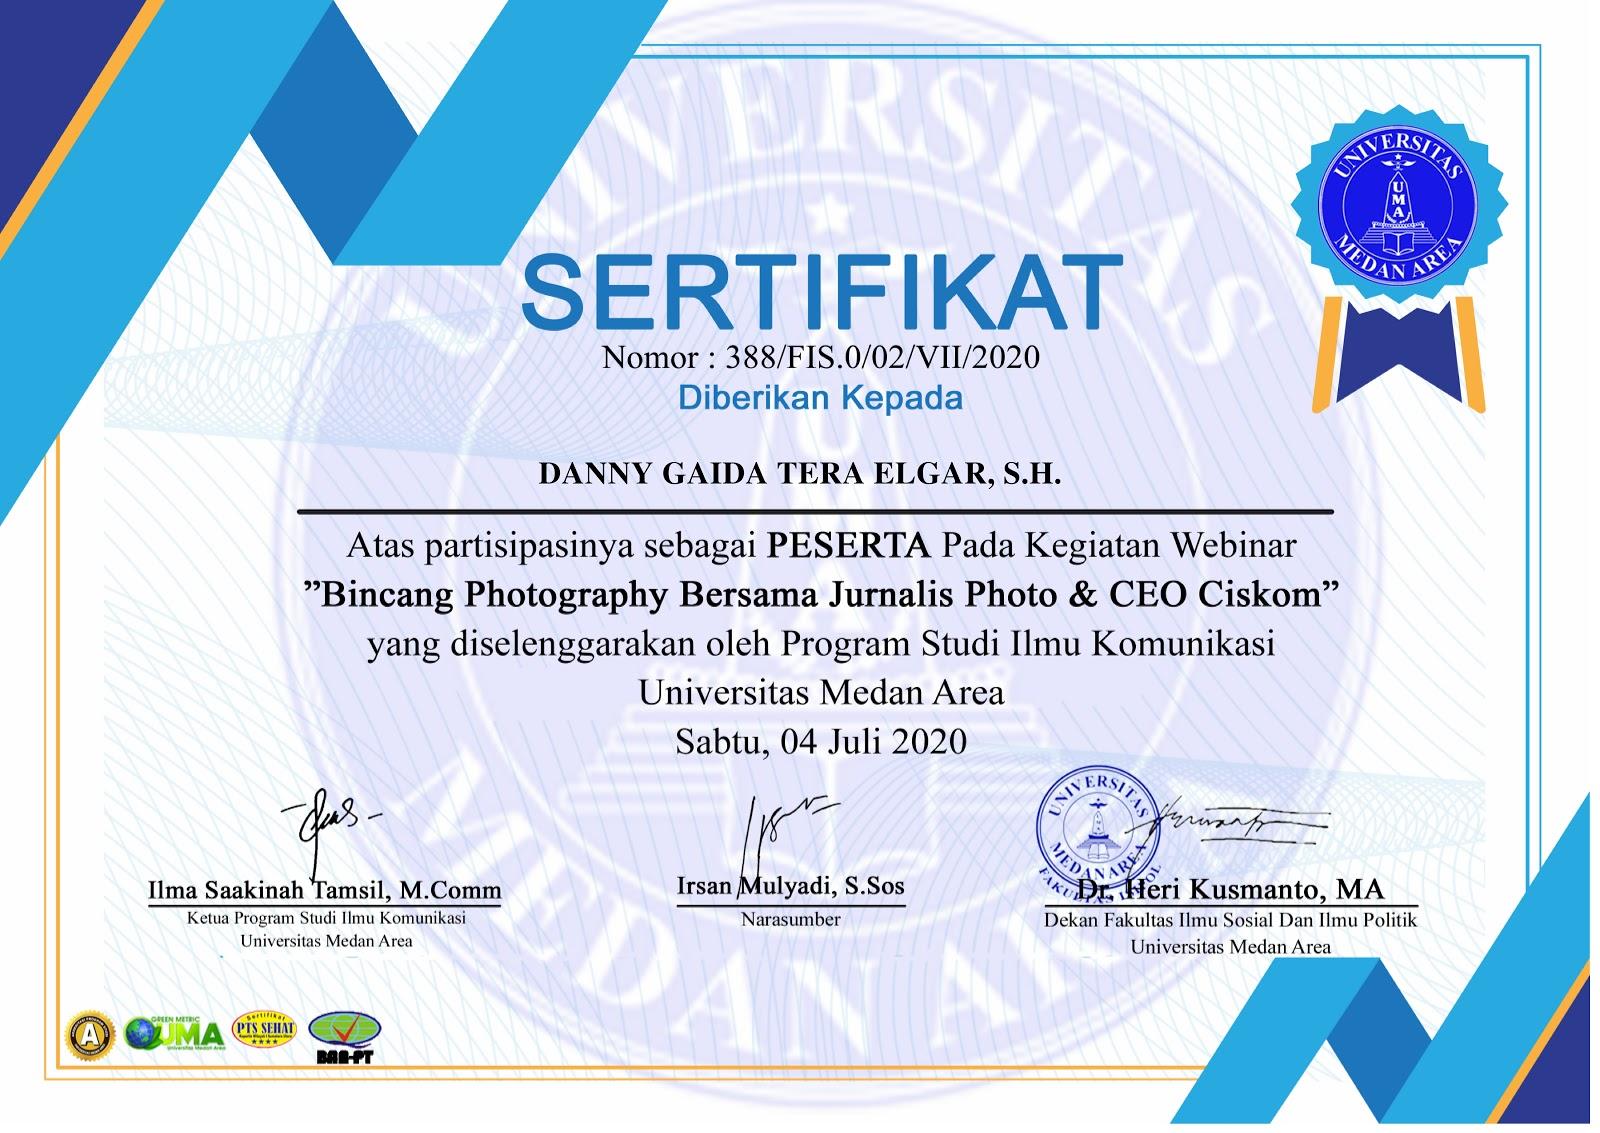 Sertifikat Bincang Photography Bersama Jurnalis Photo & CEO Ciskom | Prodi Ilmu Komunikasi Universitas Medan Area (UMA)